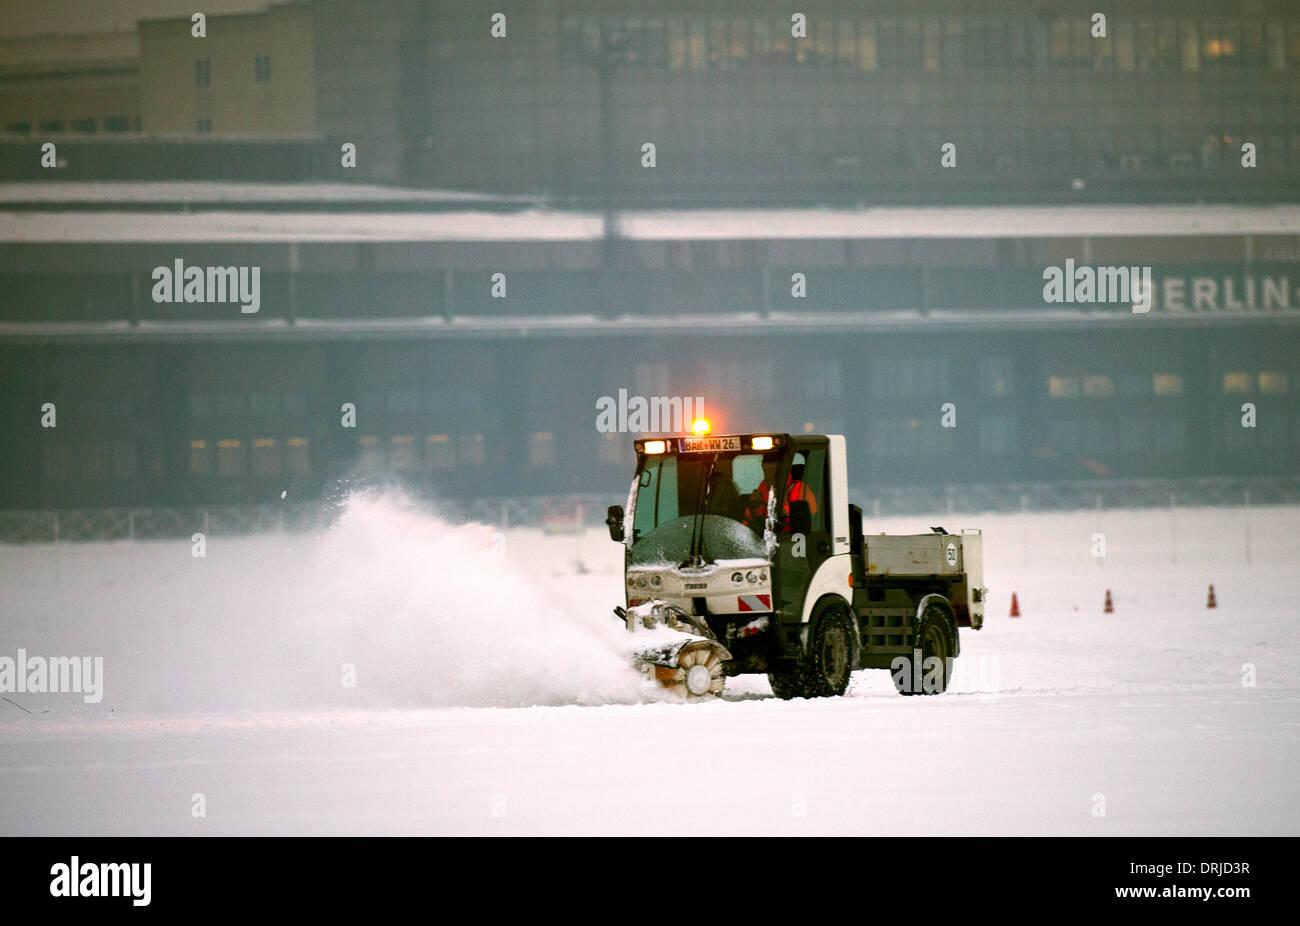 Berlin, Germany. 27th Jan, 2014. A snowplough drives through the snow on Tempelhofer Feld in Berlin, Germany, 27 January 2014. Photo: BERND VON JUTRCZENKA/DPA/Alamy Live News - Stock Image